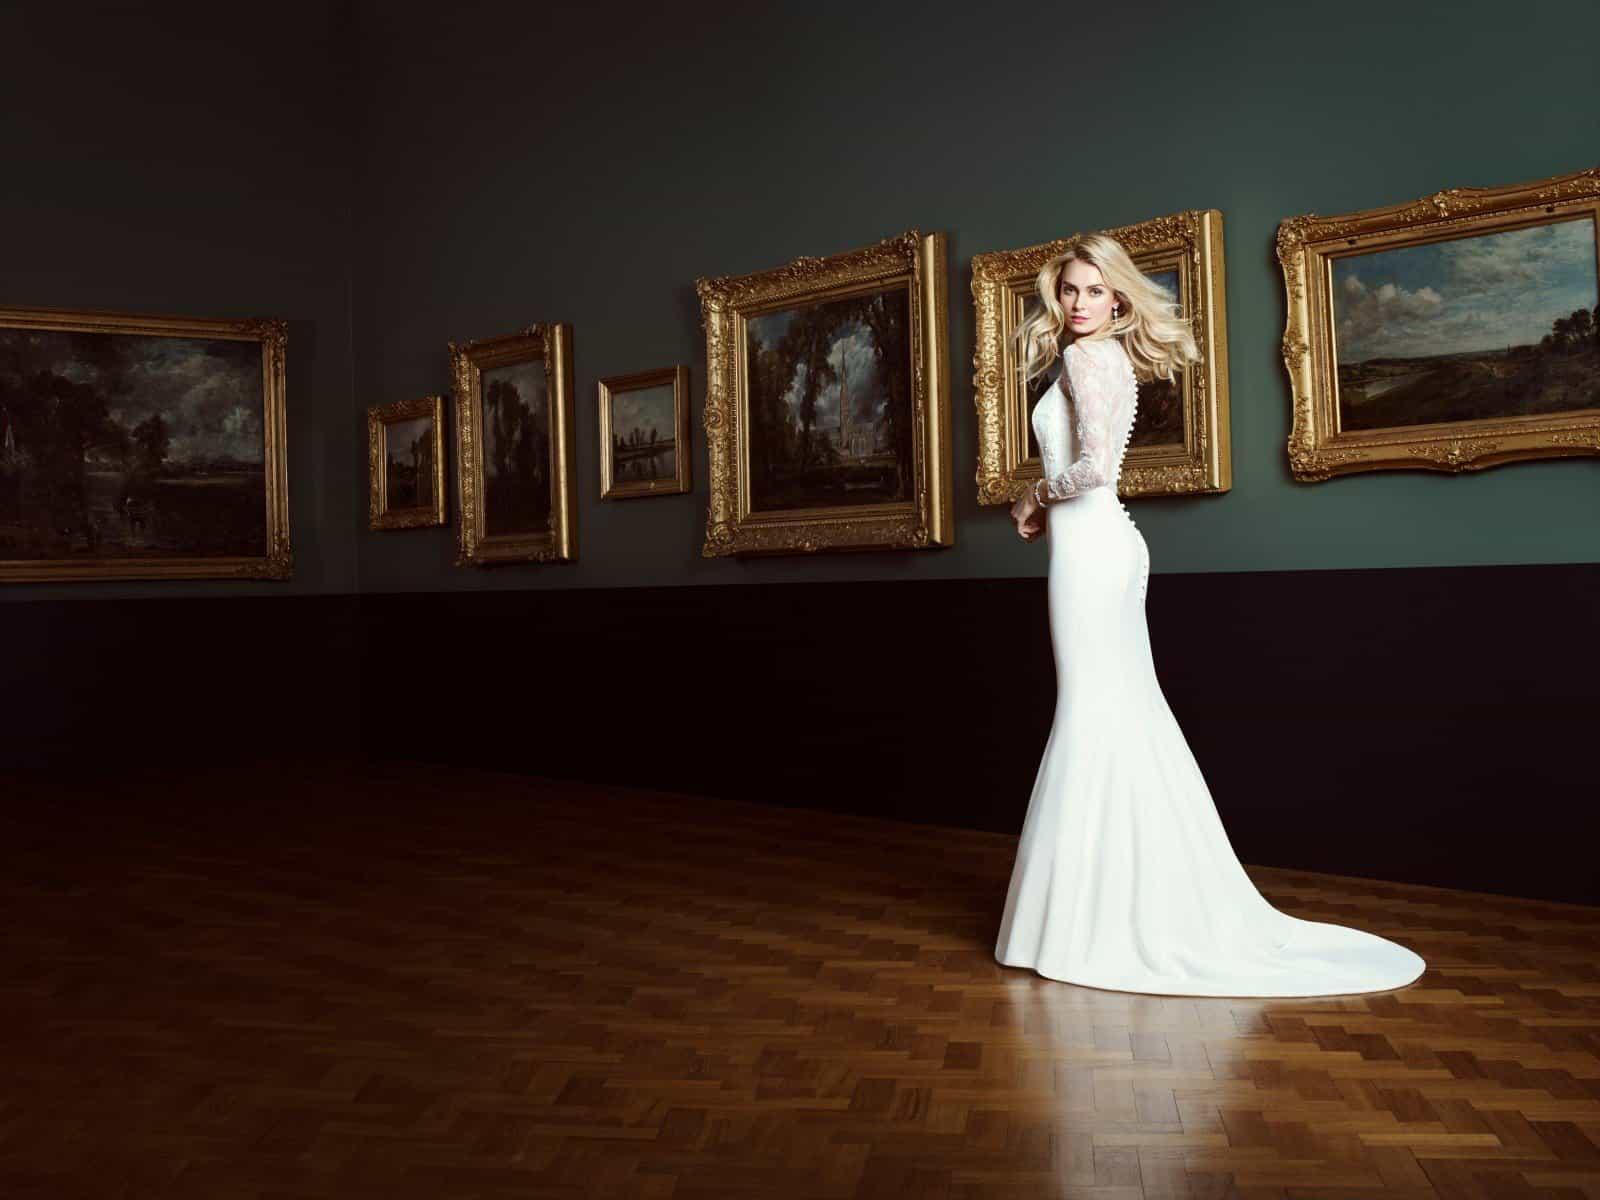 Wedding dress collection: Caroline Castigliano – Celebrating Romance